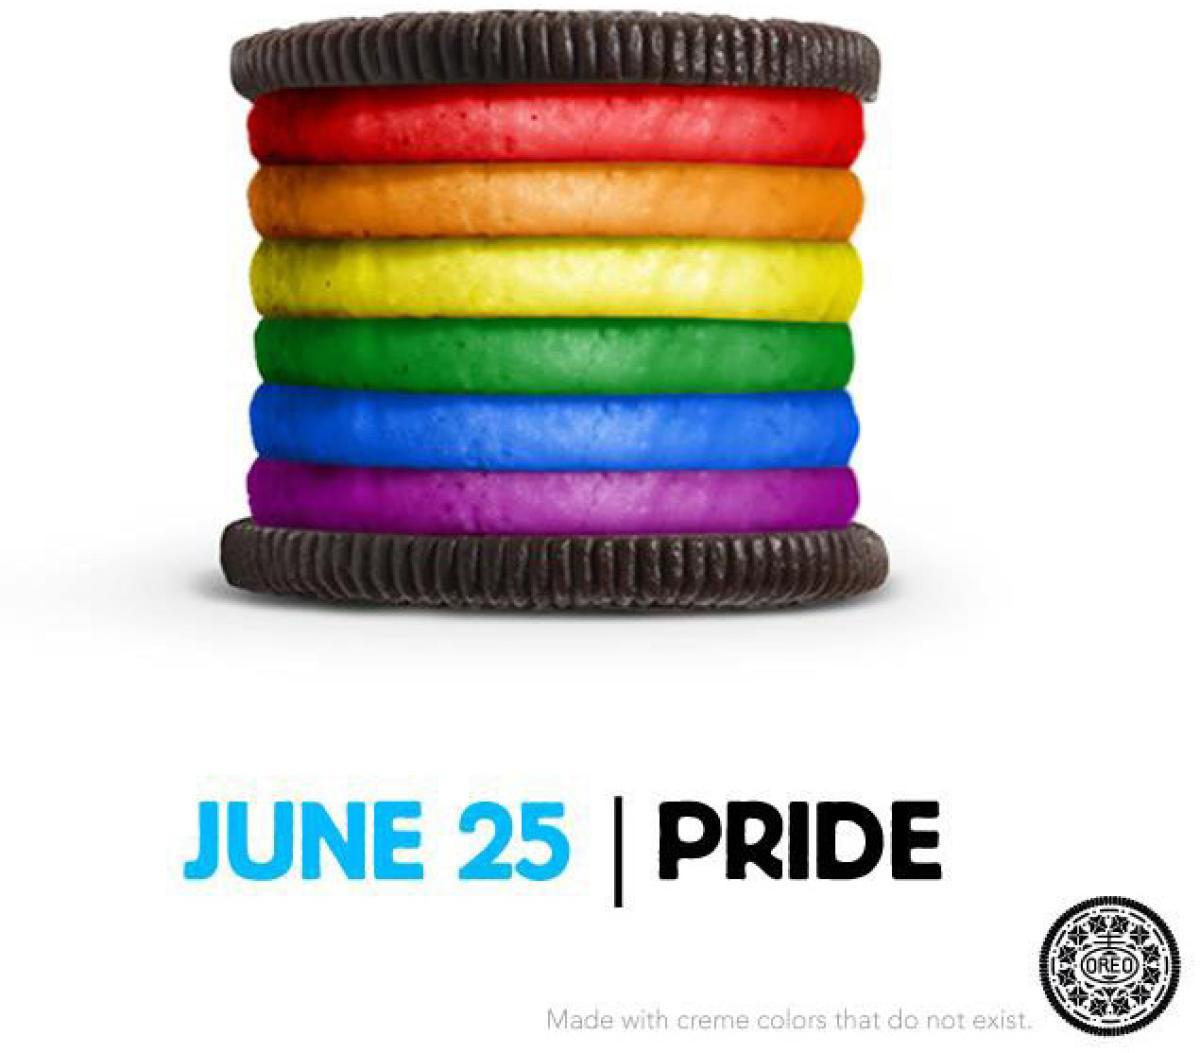 Oreo engagement gaypride